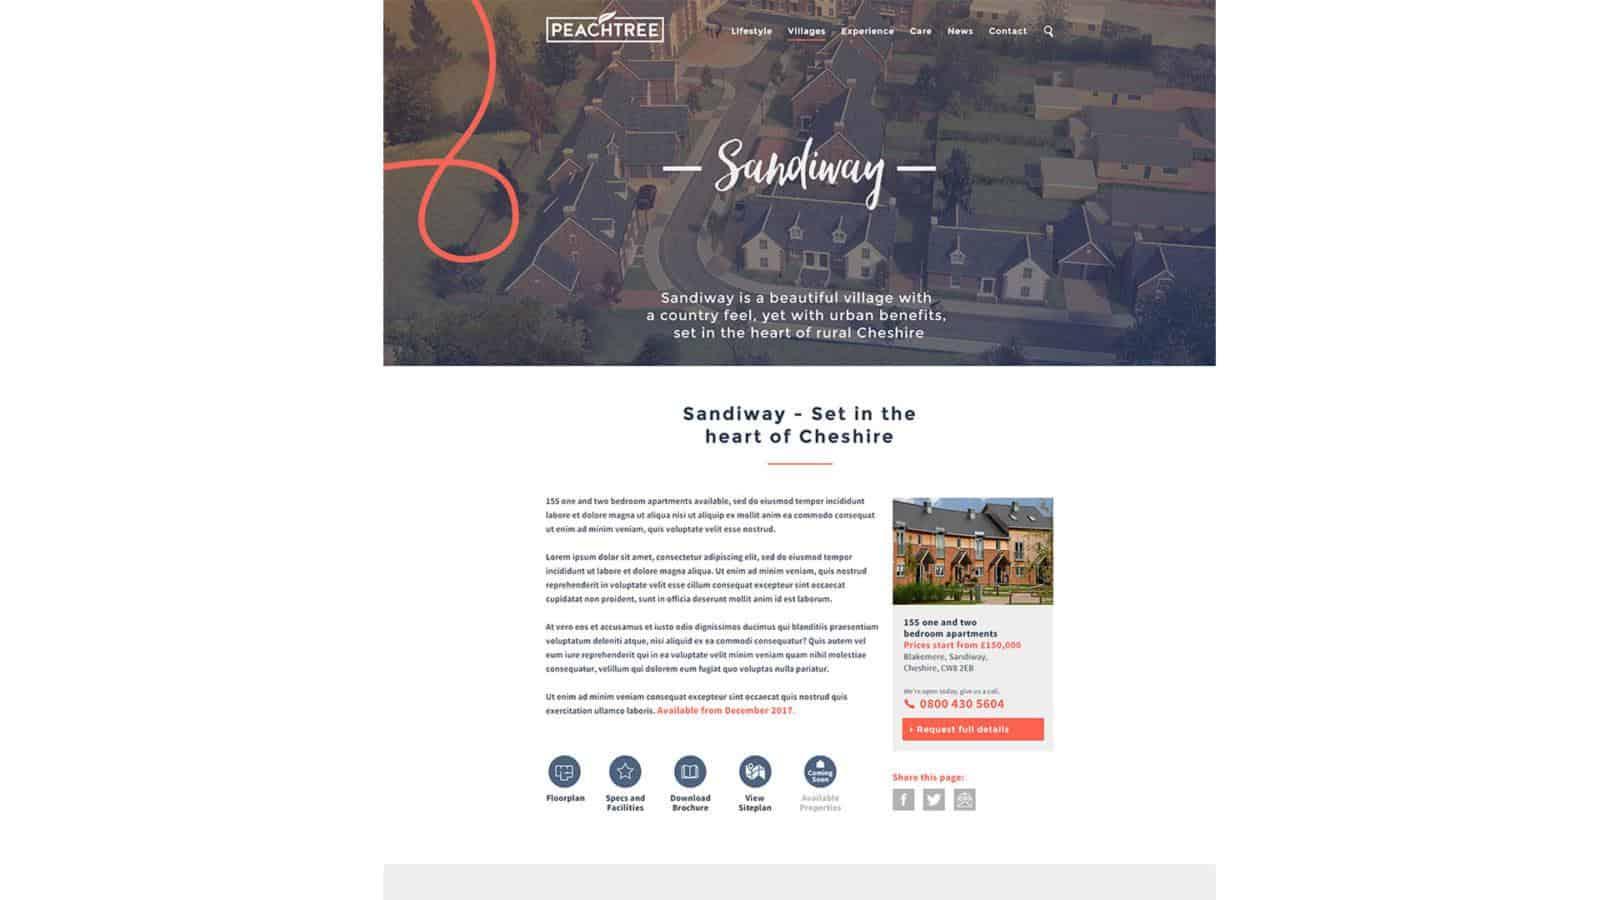 Peachtree website